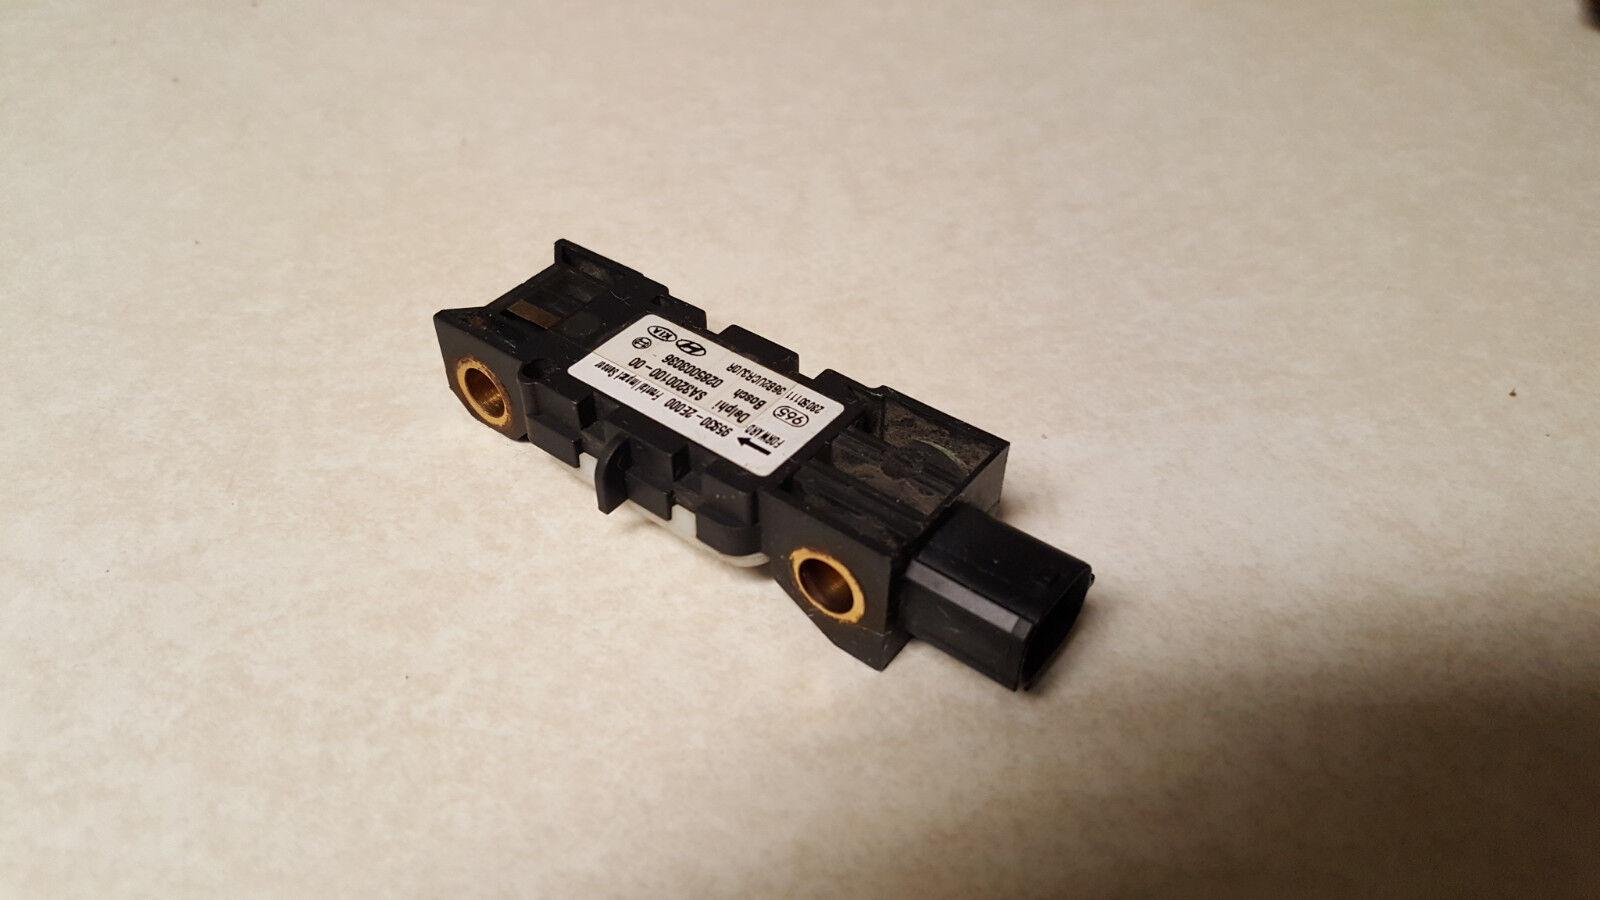 kia hyundai front Impact crash Sensor 95930-2E000 959302E000 a404